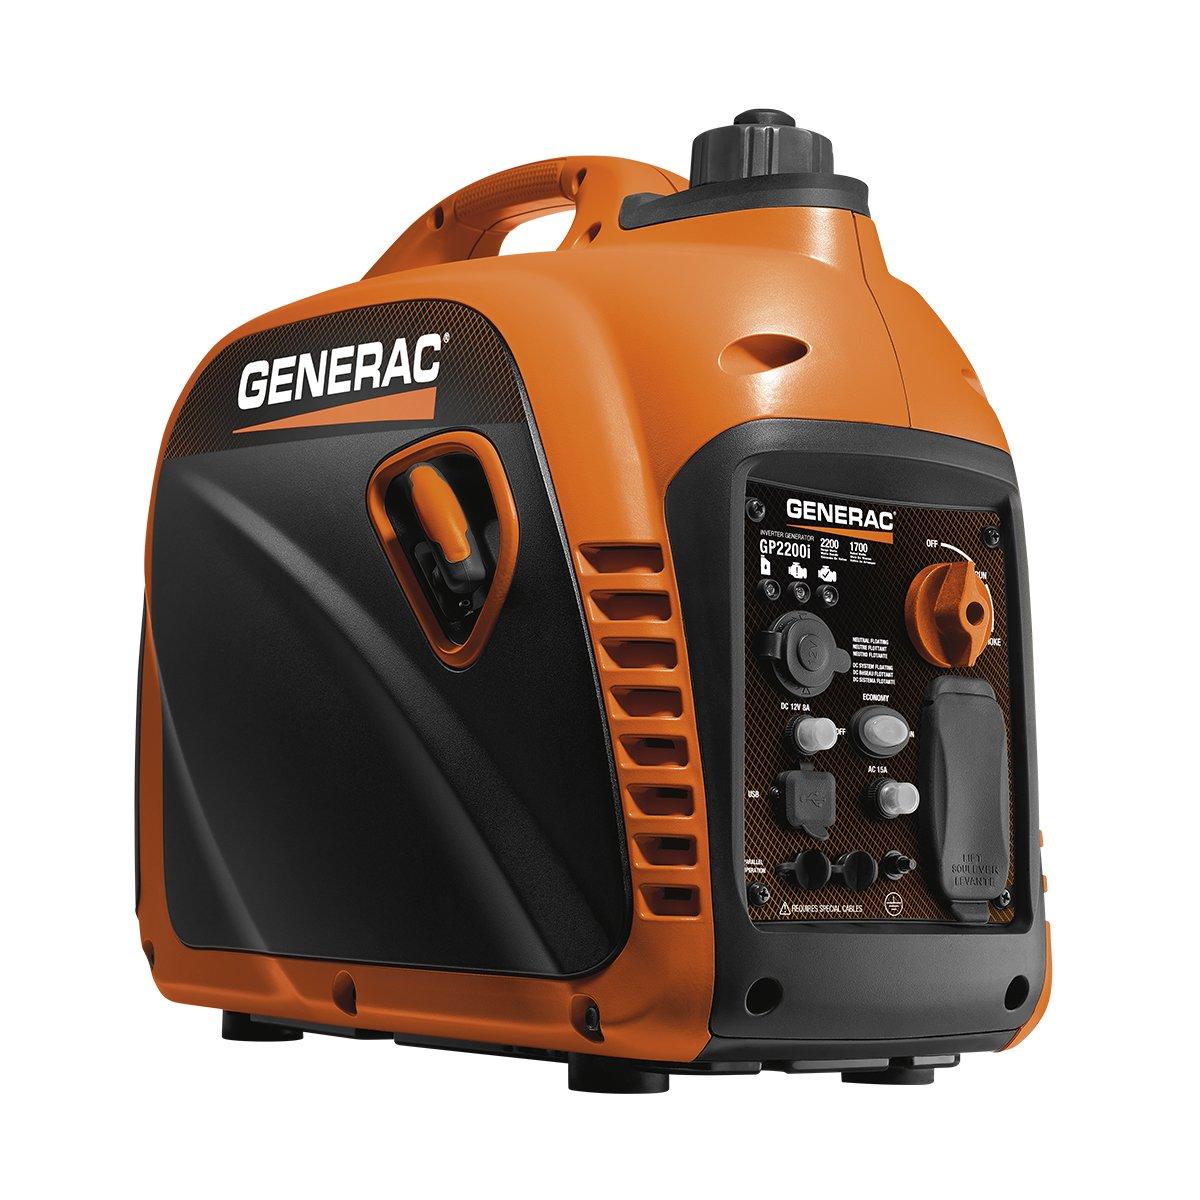 Generac 7117 GP2200i 2200 Watt Portable Inverter Generator - Parallel Ready by Generac